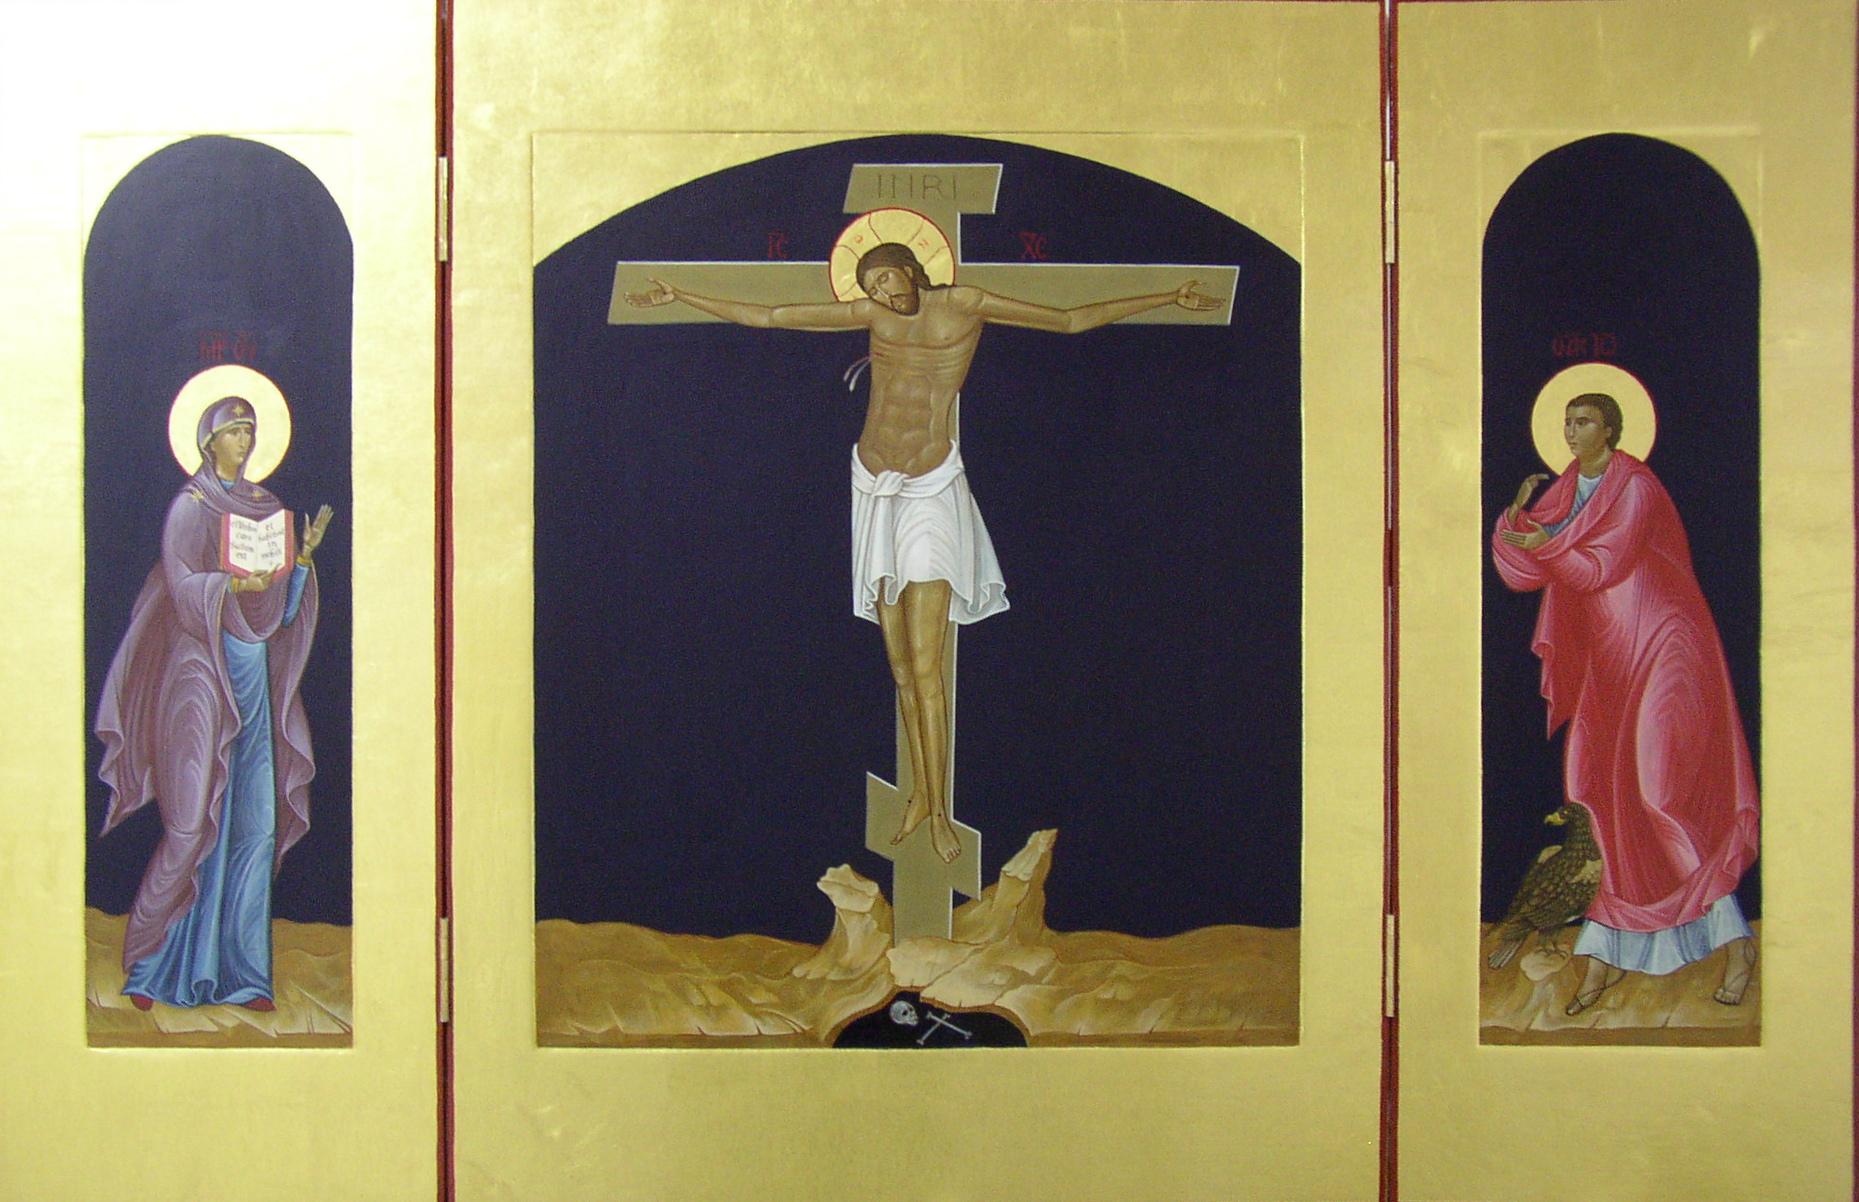 Crucifixion Triptych.  Tempera, gold leaf on gessoed panels 93 cm x 142 cm.  Nottingham University Catholic Chaplaincy.  2010